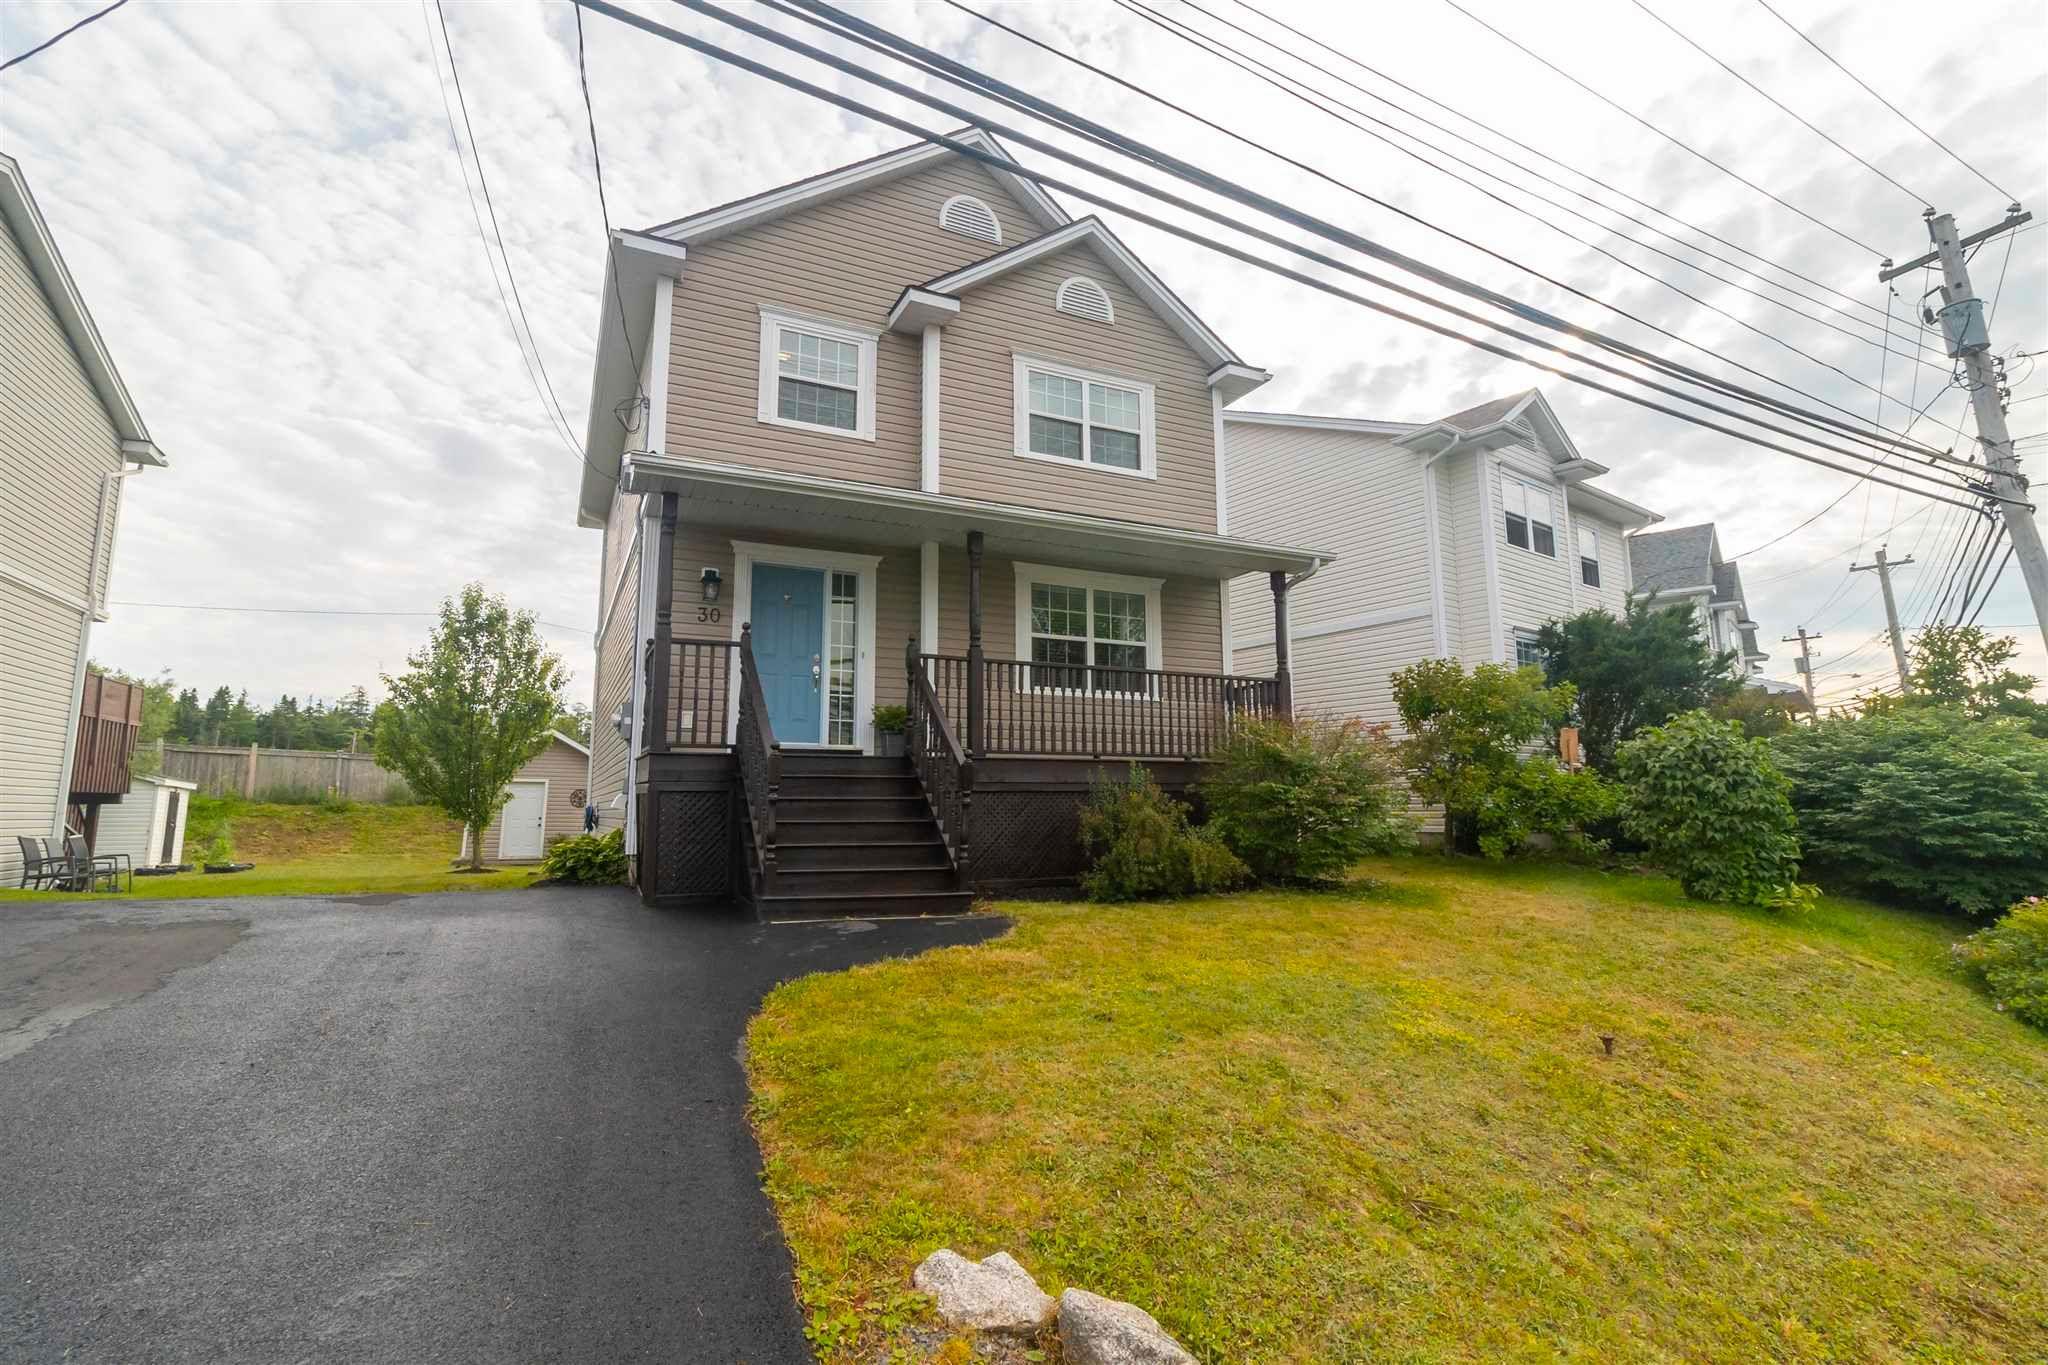 Main Photo: 30 Trinity Way in Timberlea: 40-Timberlea, Prospect, St. Margaret`S Bay Residential for sale (Halifax-Dartmouth)  : MLS®# 202117875